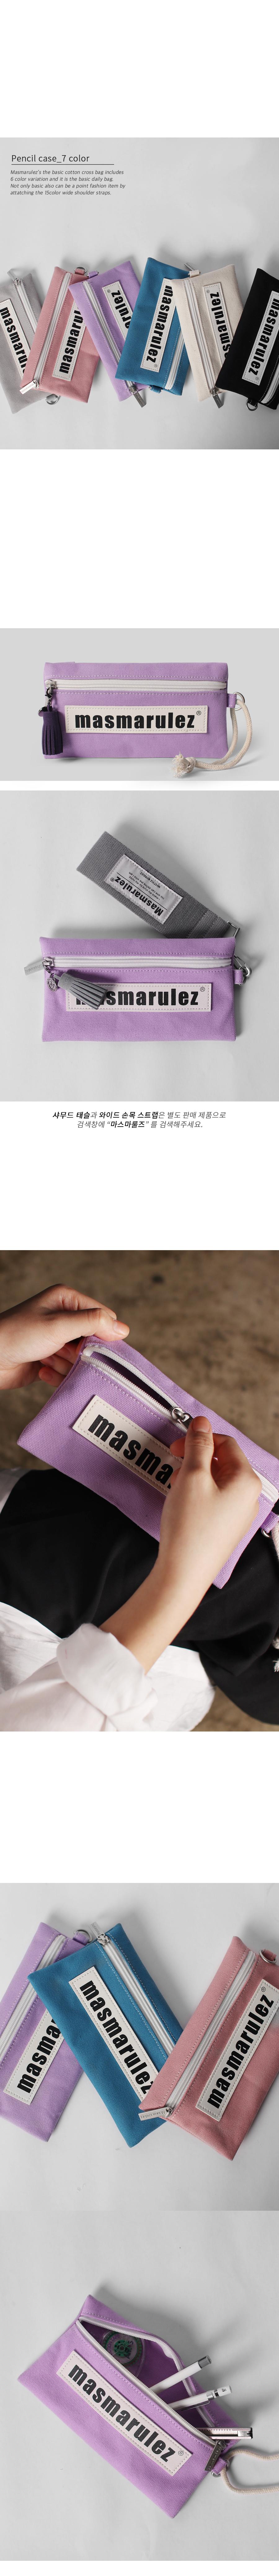 purple-d1.jpg